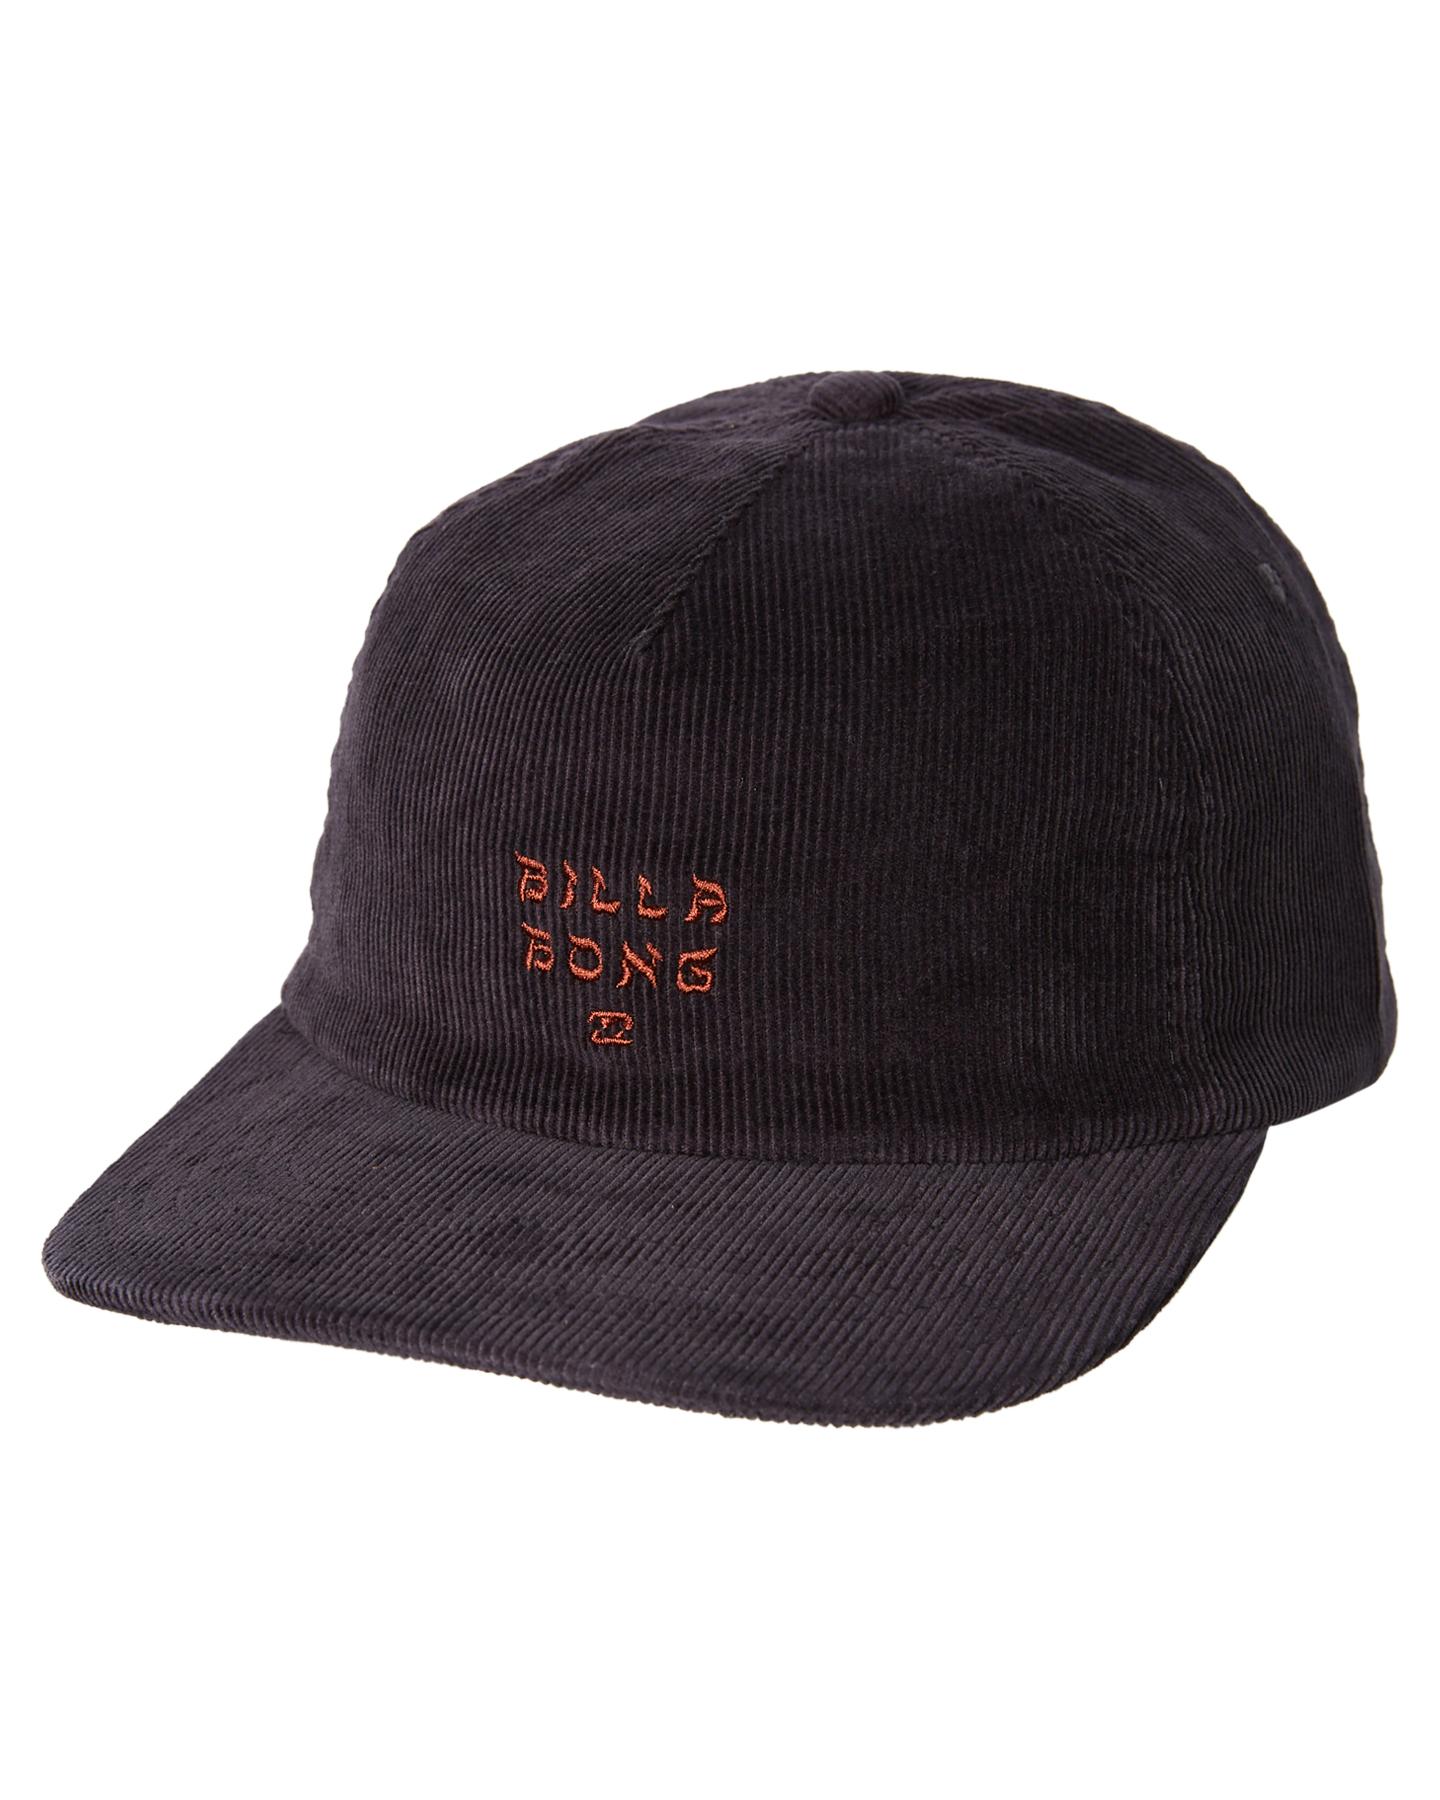 Details about New Billabong Men s Peyote Cord Snapback Cap Cotton Corduroy  Black 8e16ed15a5